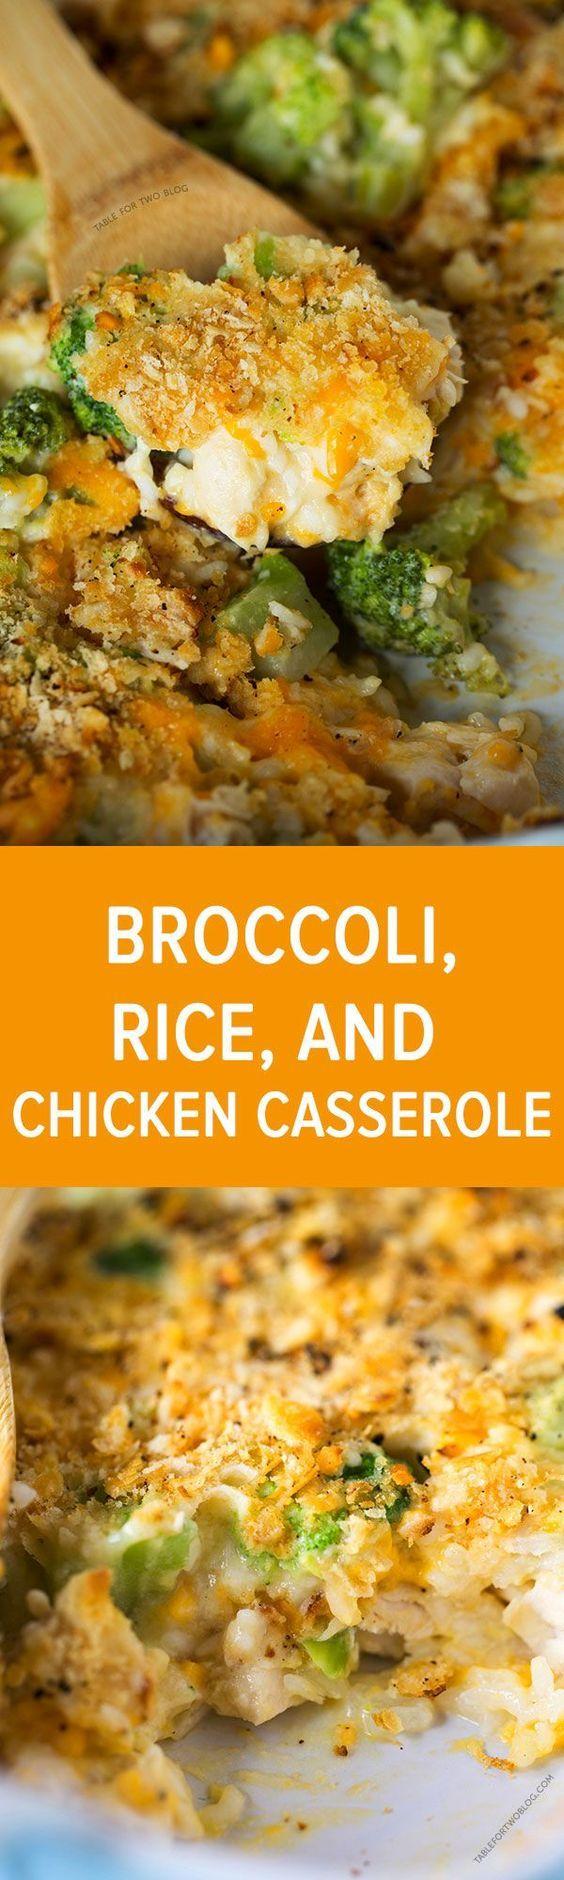 Broccoli Rice and Chicken Casserole